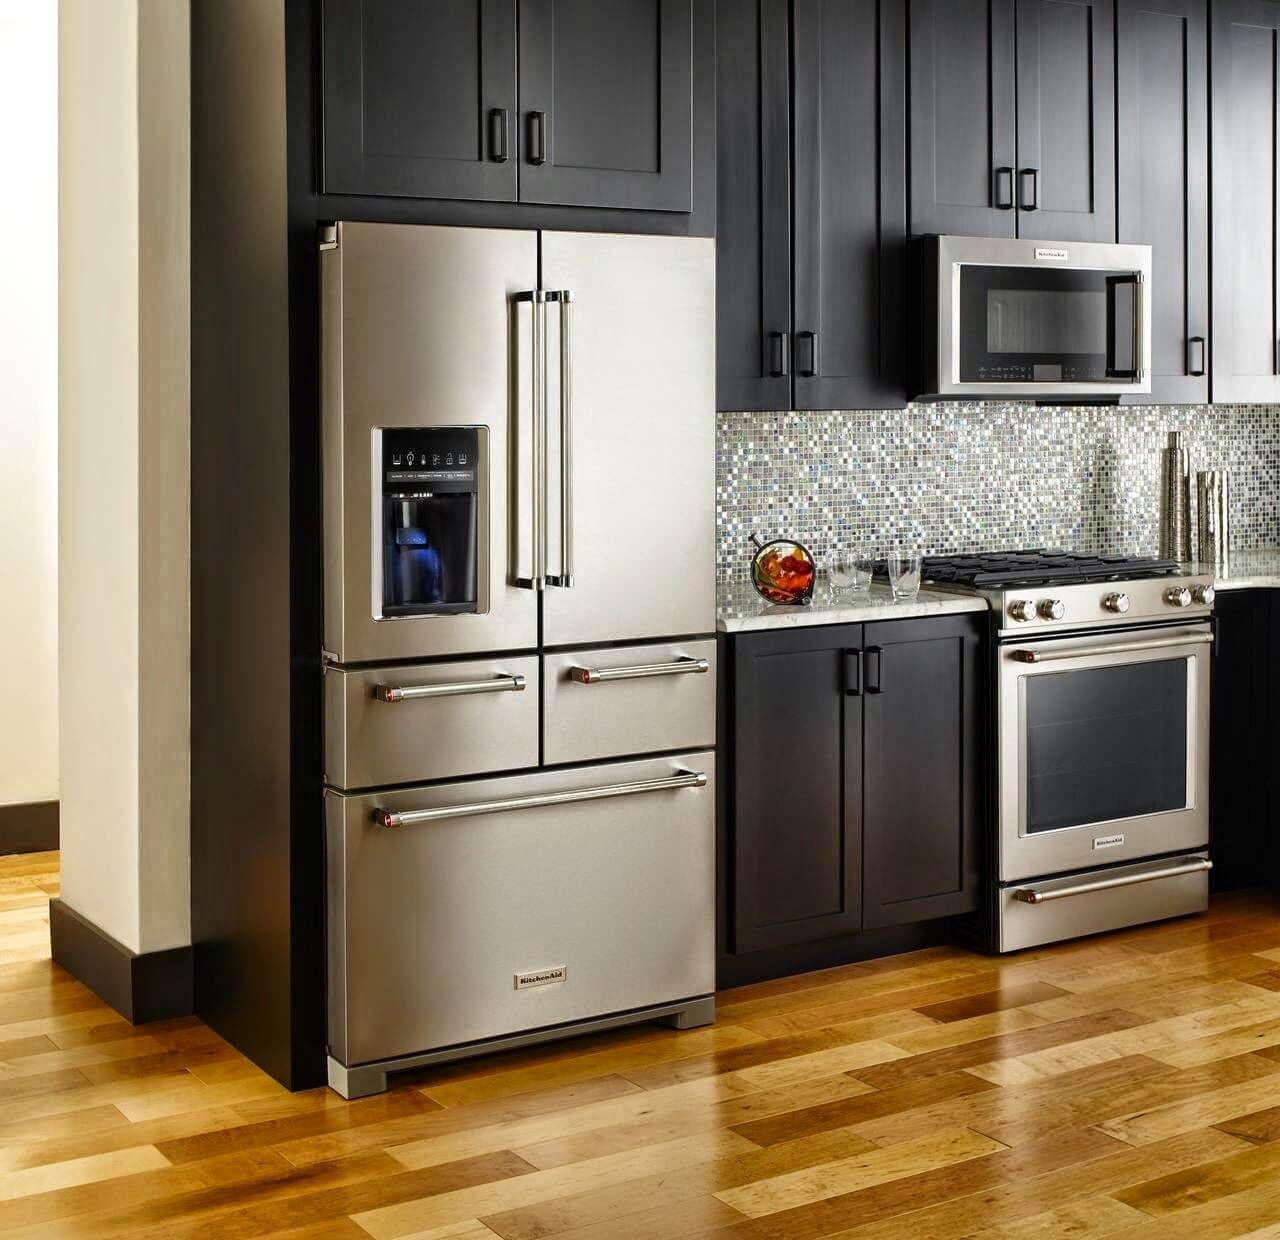 2015 kitchenaid 5 door fridge kitchen aid appliances